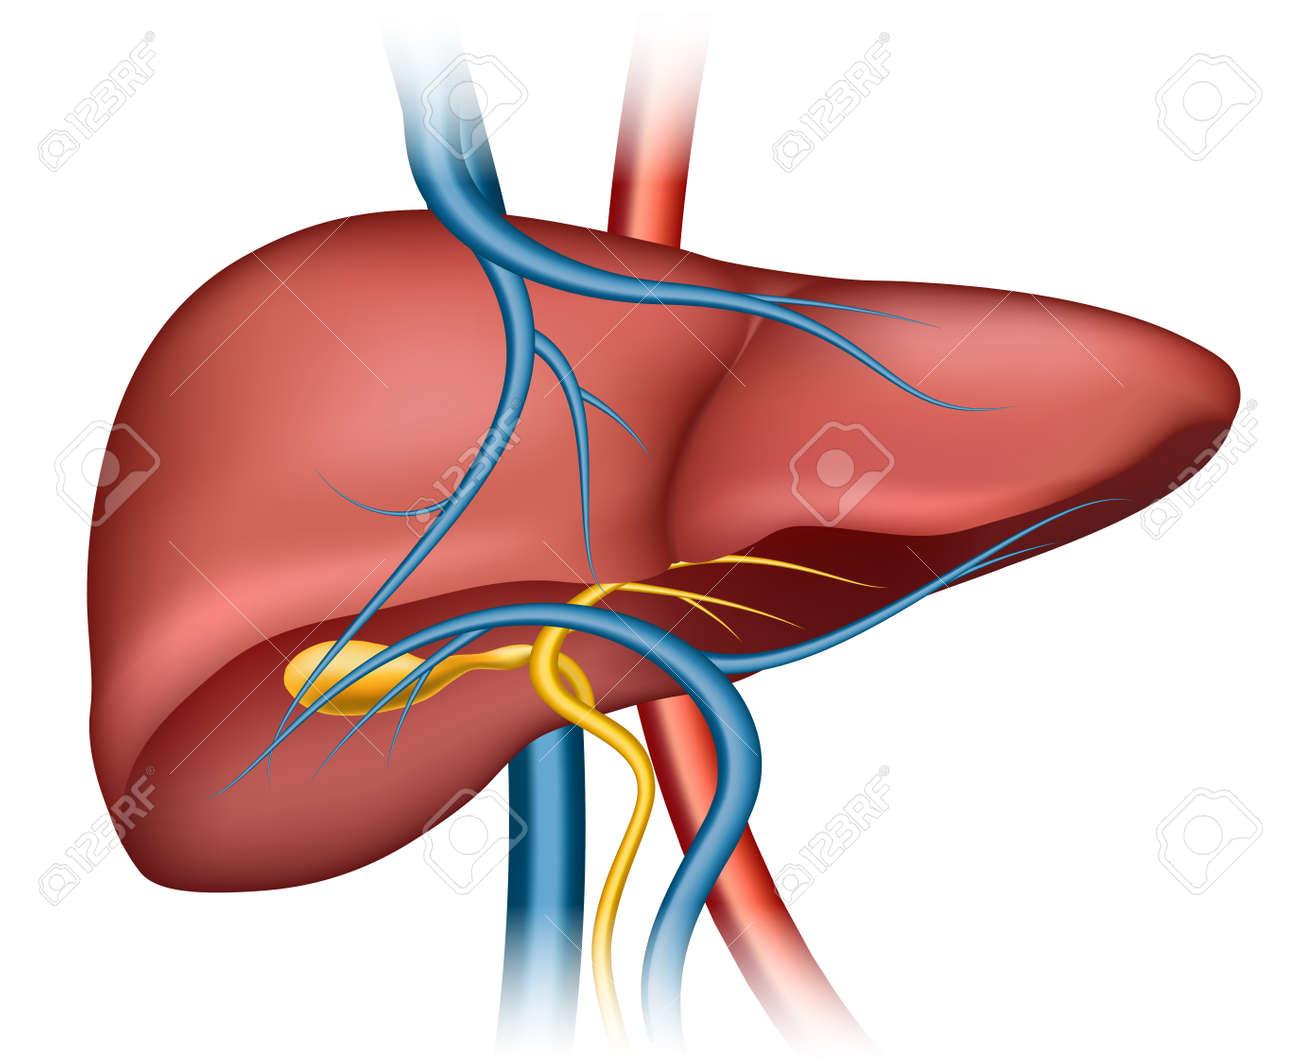 Human liver structure. Organ human, medical science, health internal, vector illustration - 166759678